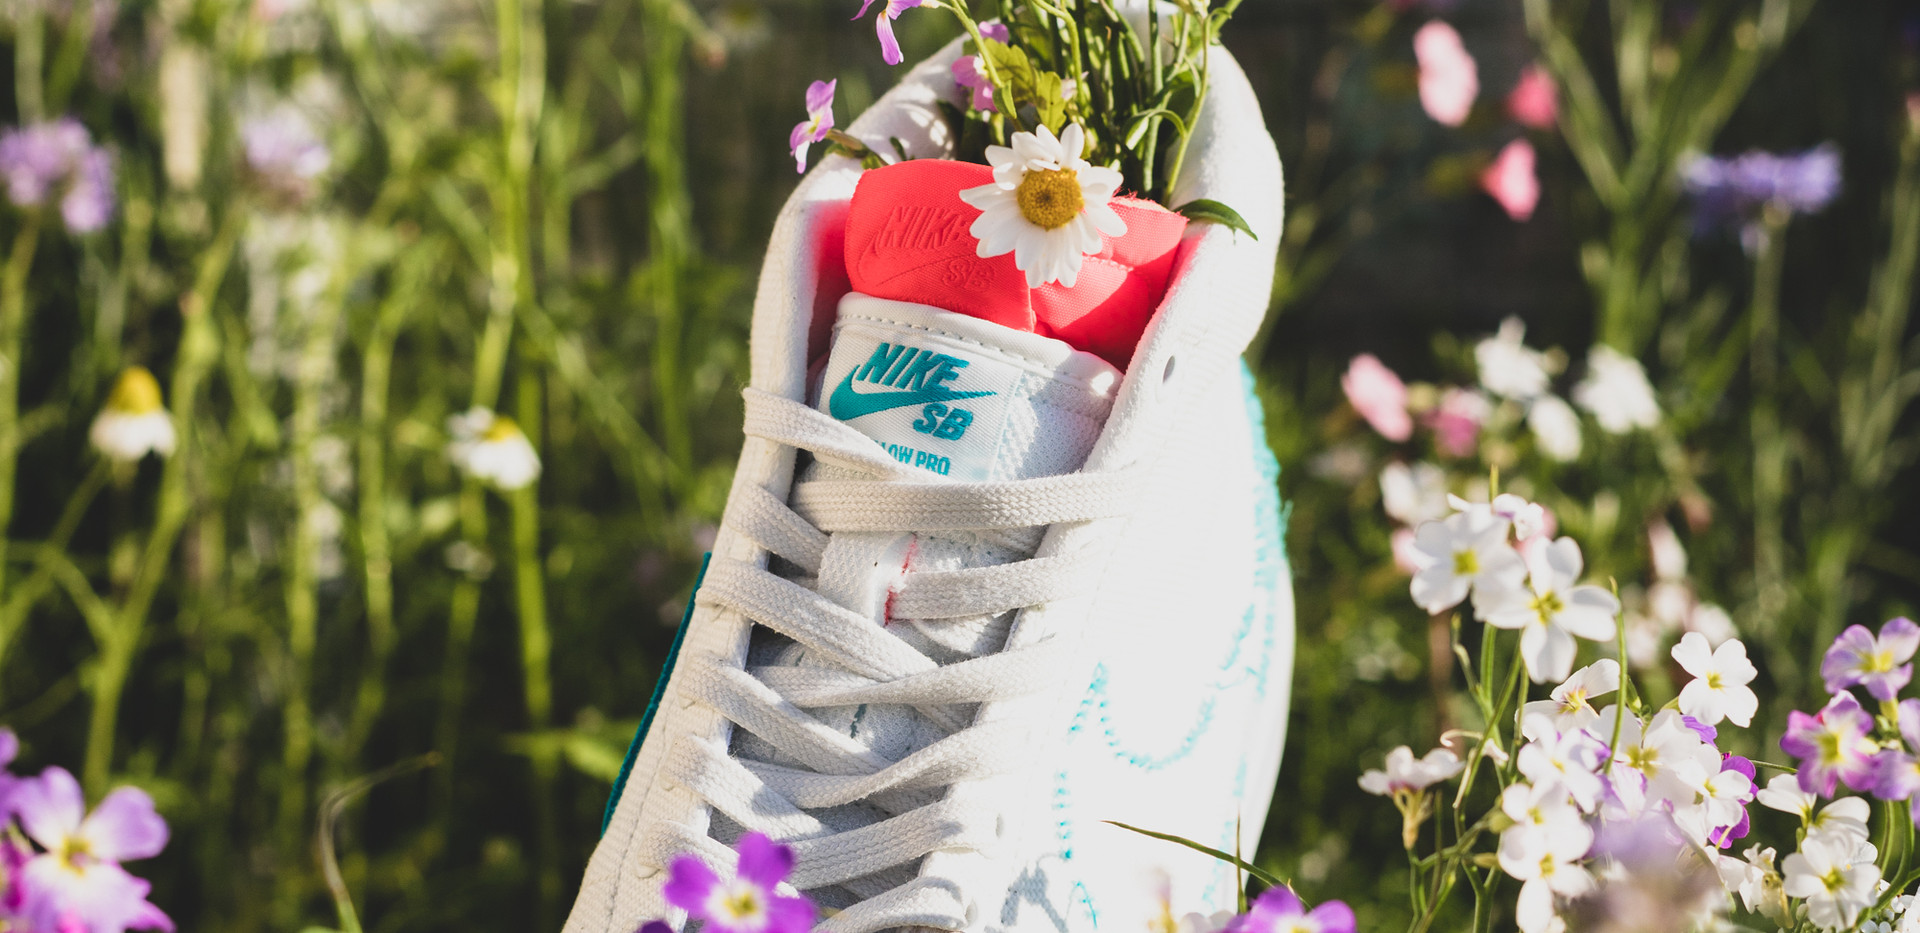 Nikes_Product Fotos_1.jpg